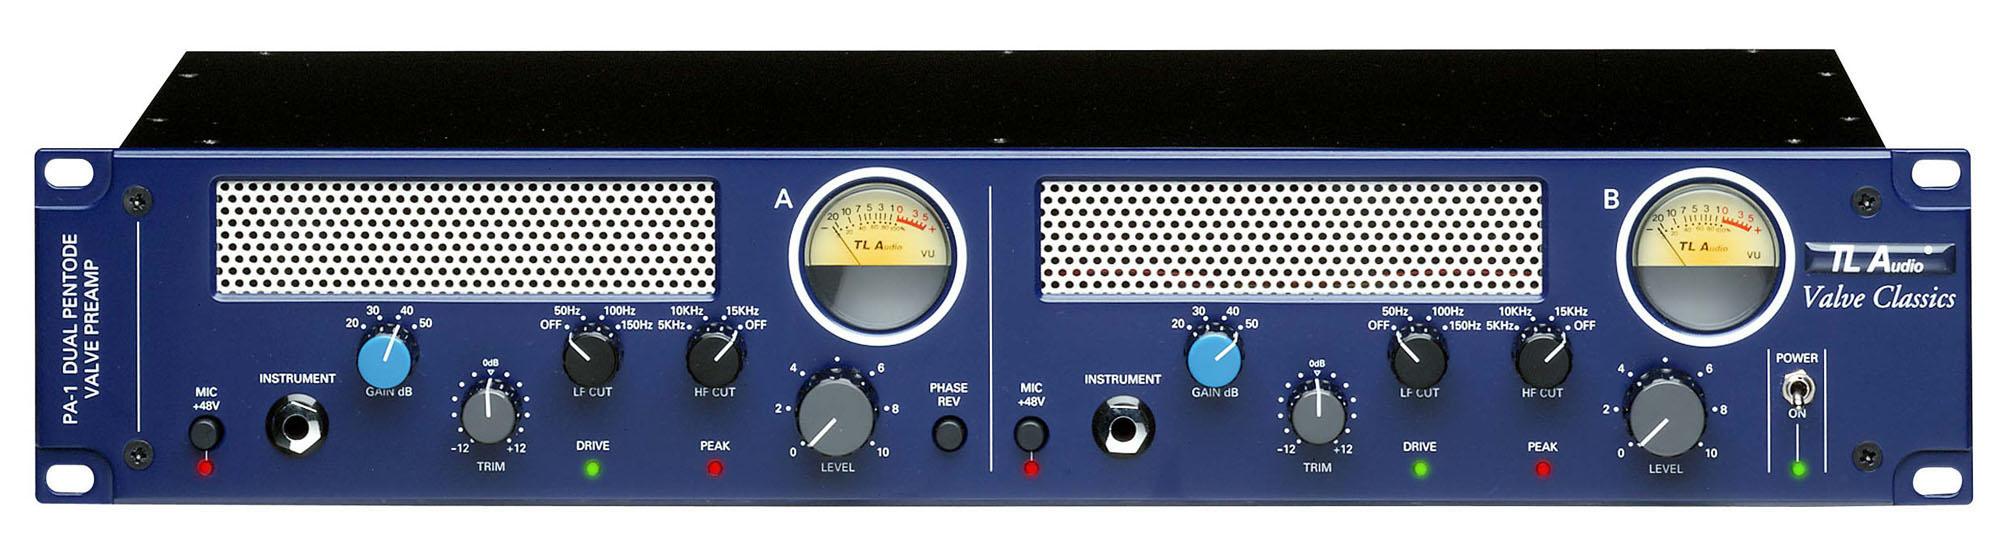 tl-audio-pa-1-dual-pentode-valve-pre-amp-449017.jpg